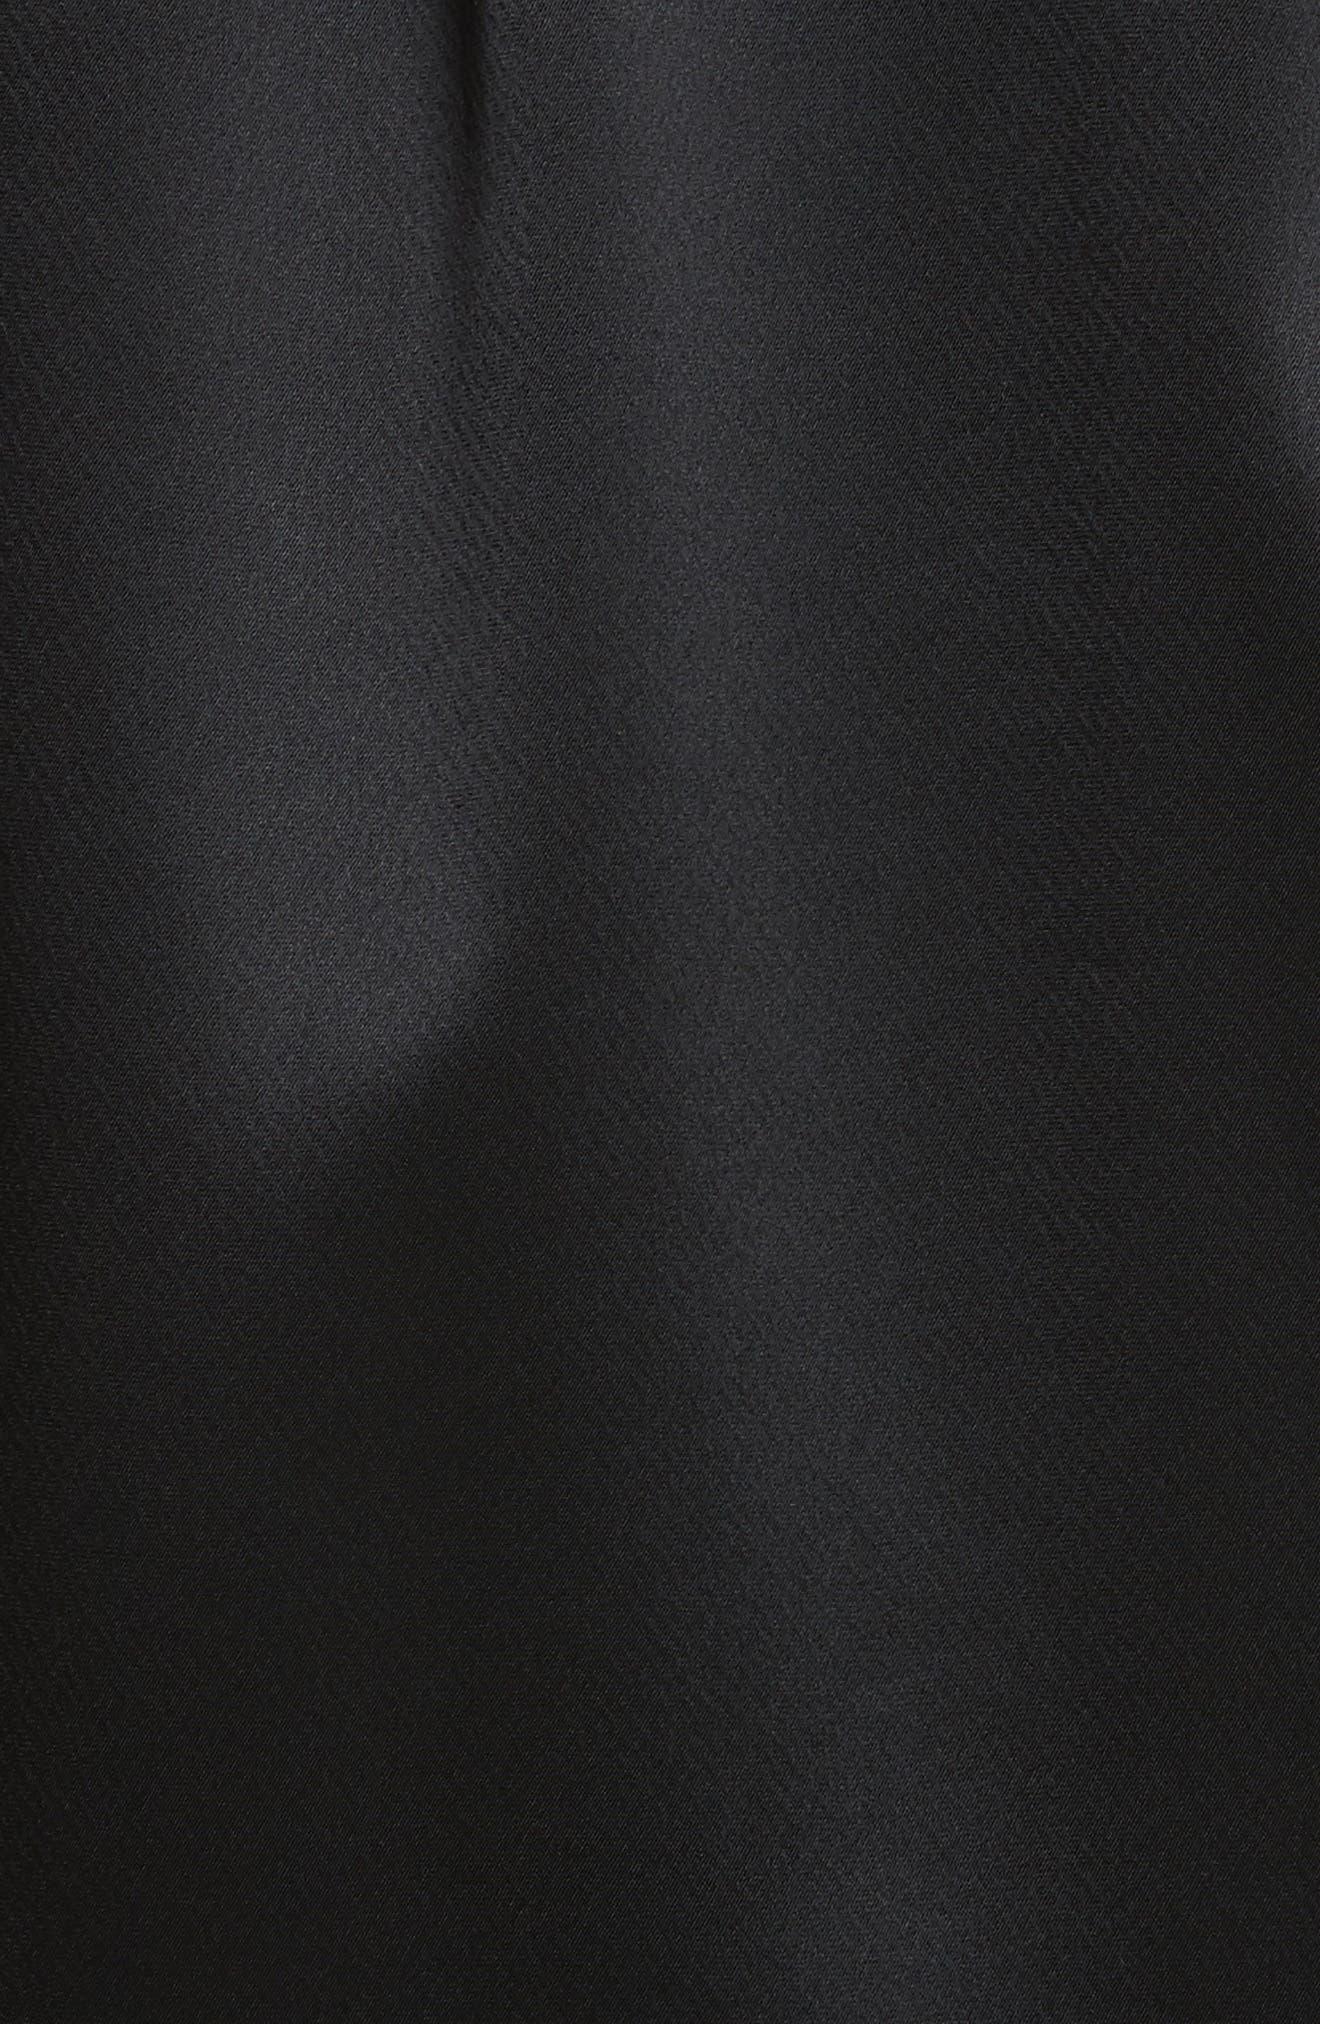 Brea Reverie Satin Cloth Bomber Jacket,                             Alternate thumbnail 6, color,                             001